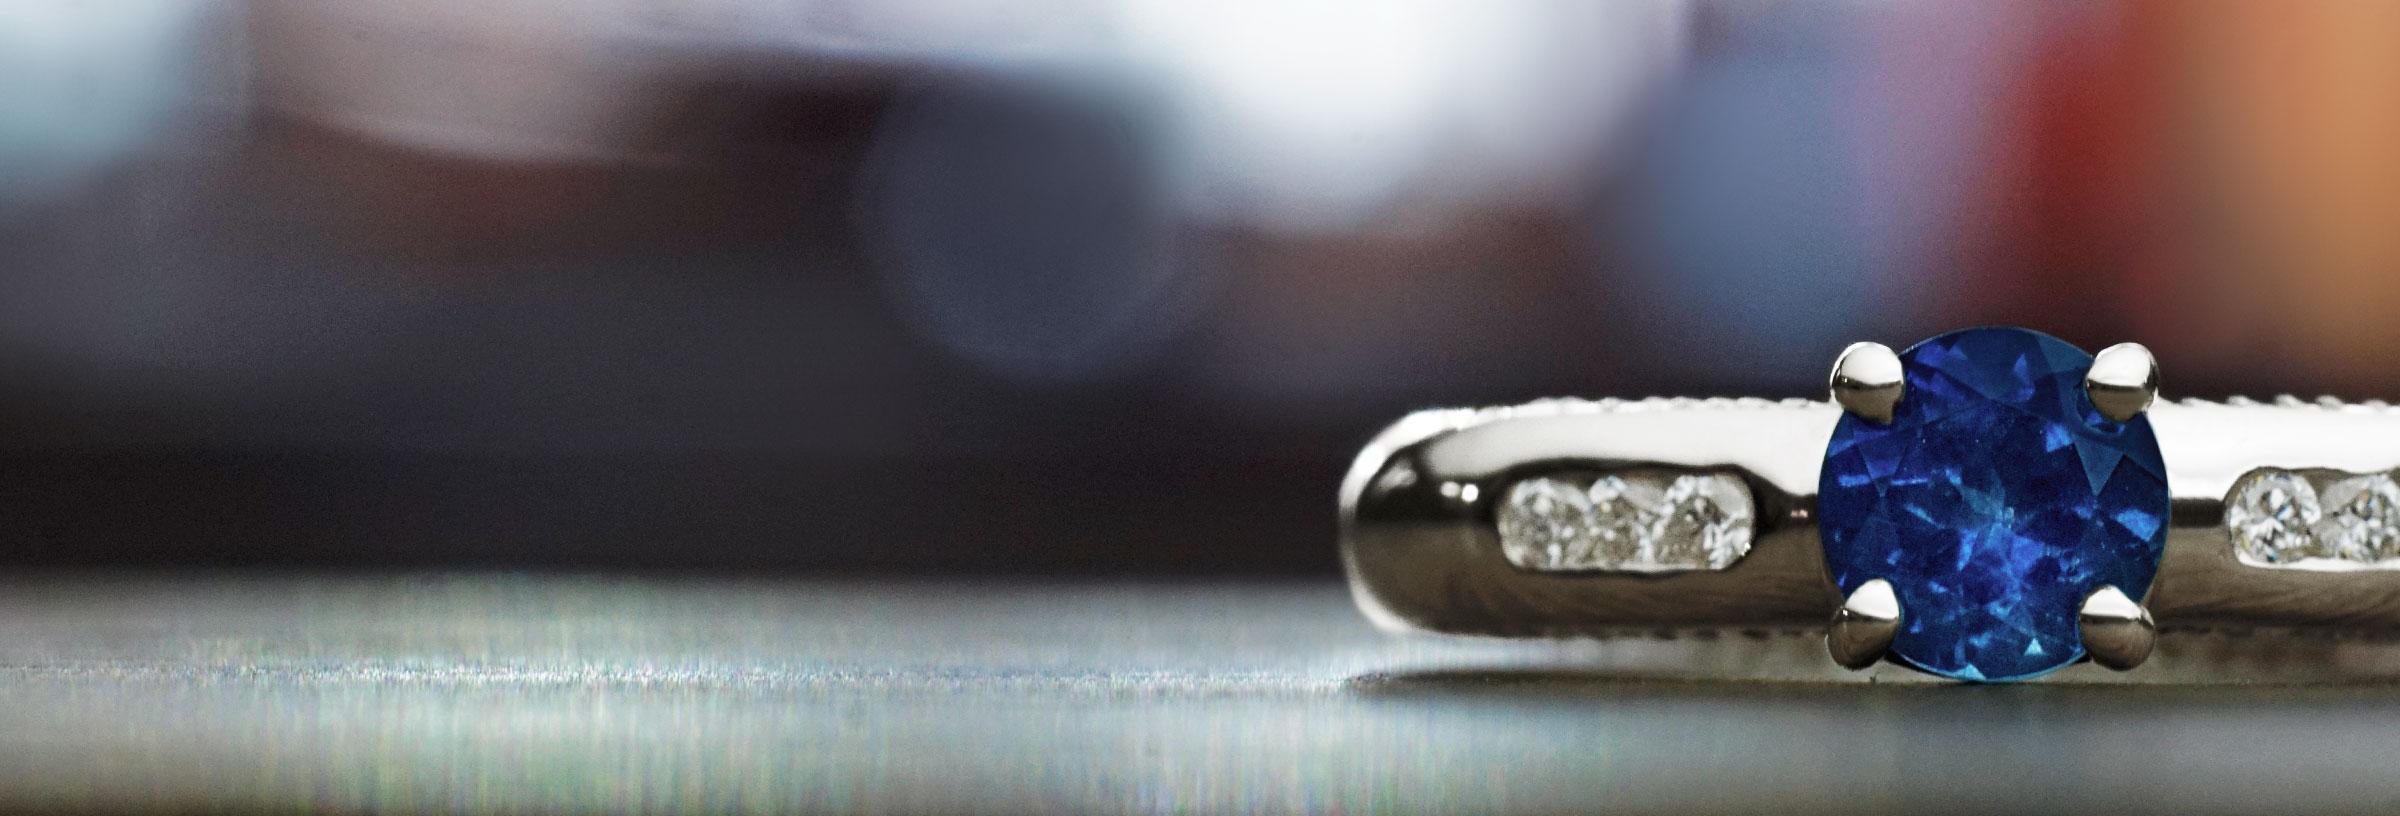 Cornflower blue 0.61ct sapphire, diamond and 9ct white gold engagement ring